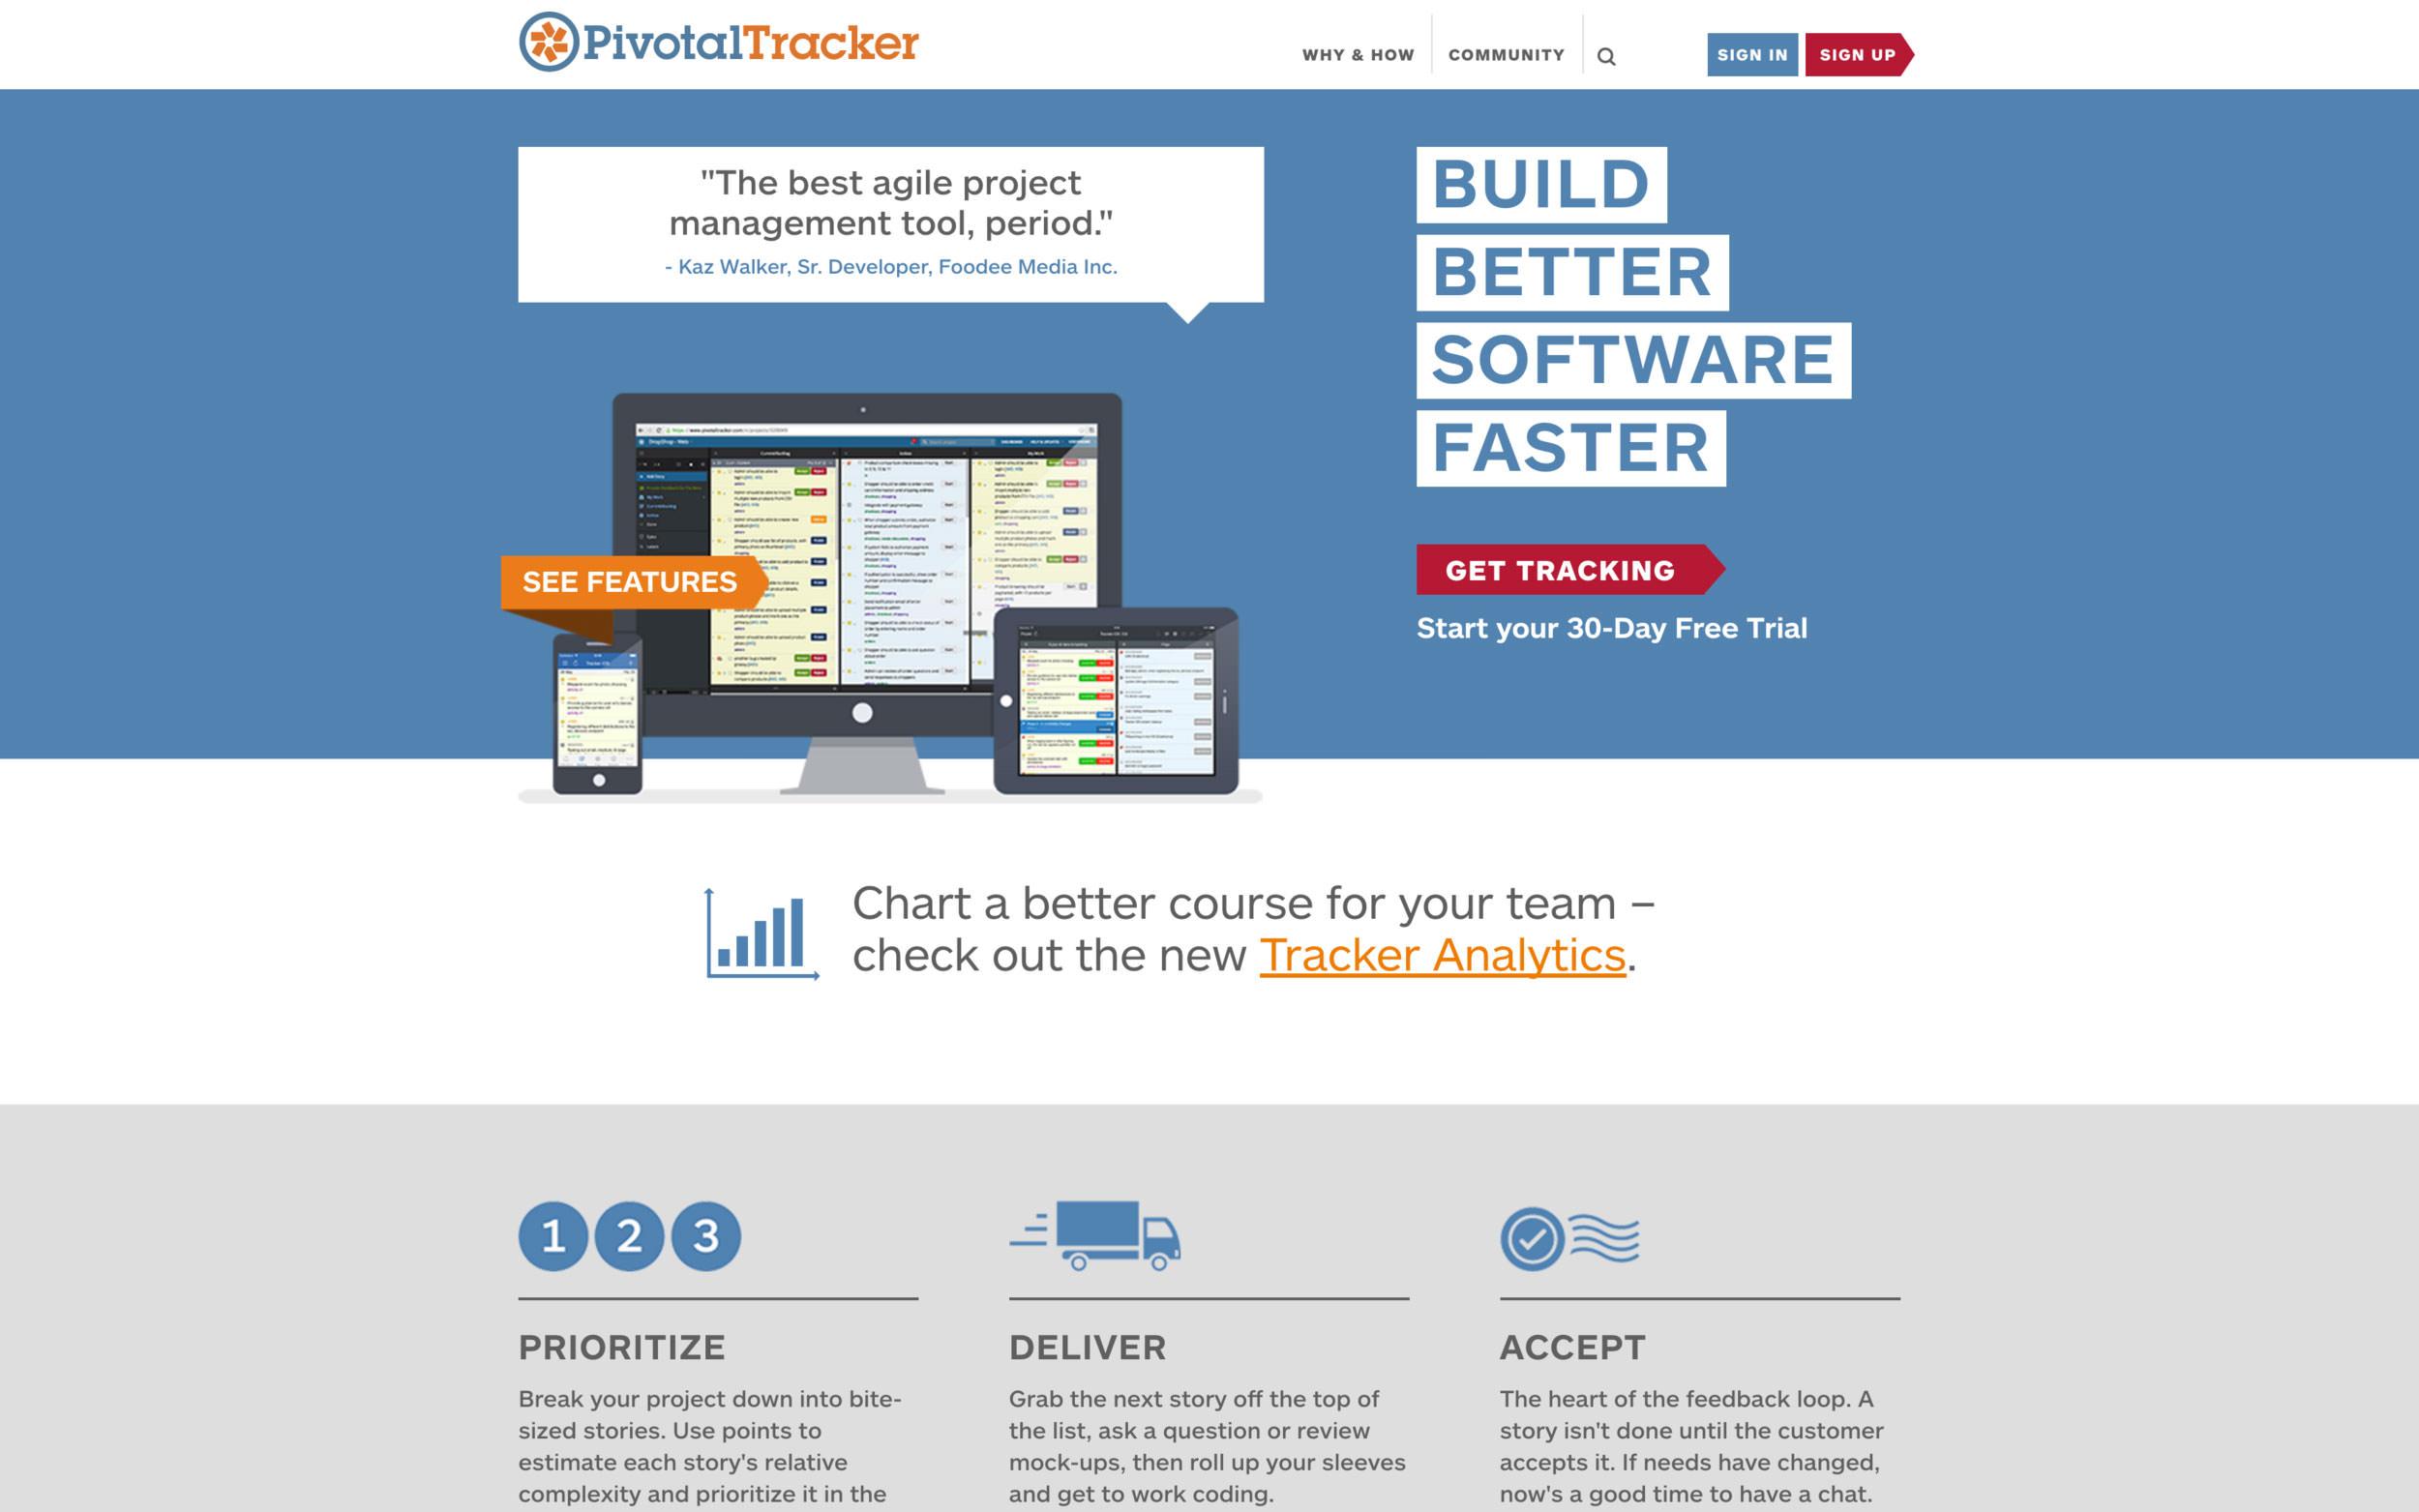 Ferramentas-para-empreendedores-Pivotal-Tracker.jpg